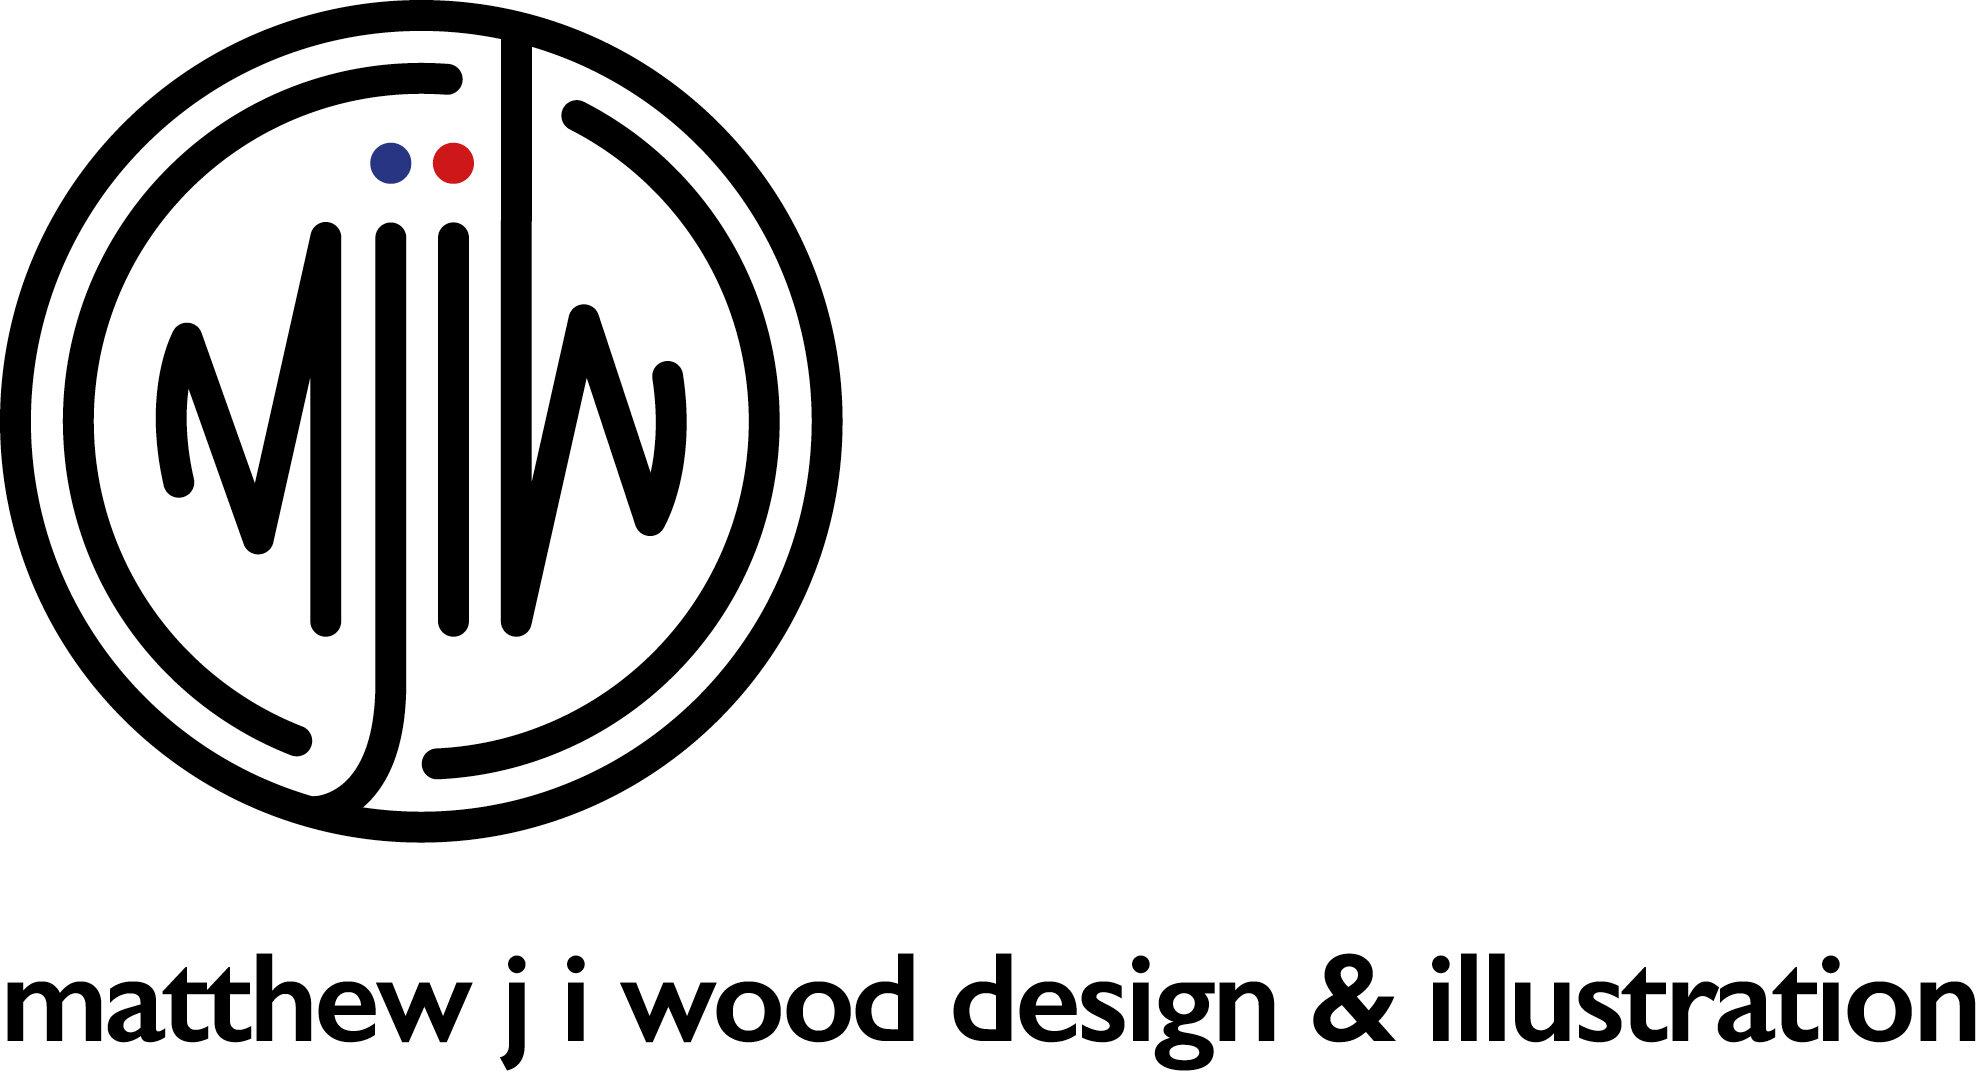 MJIW Logo & Name.jpg